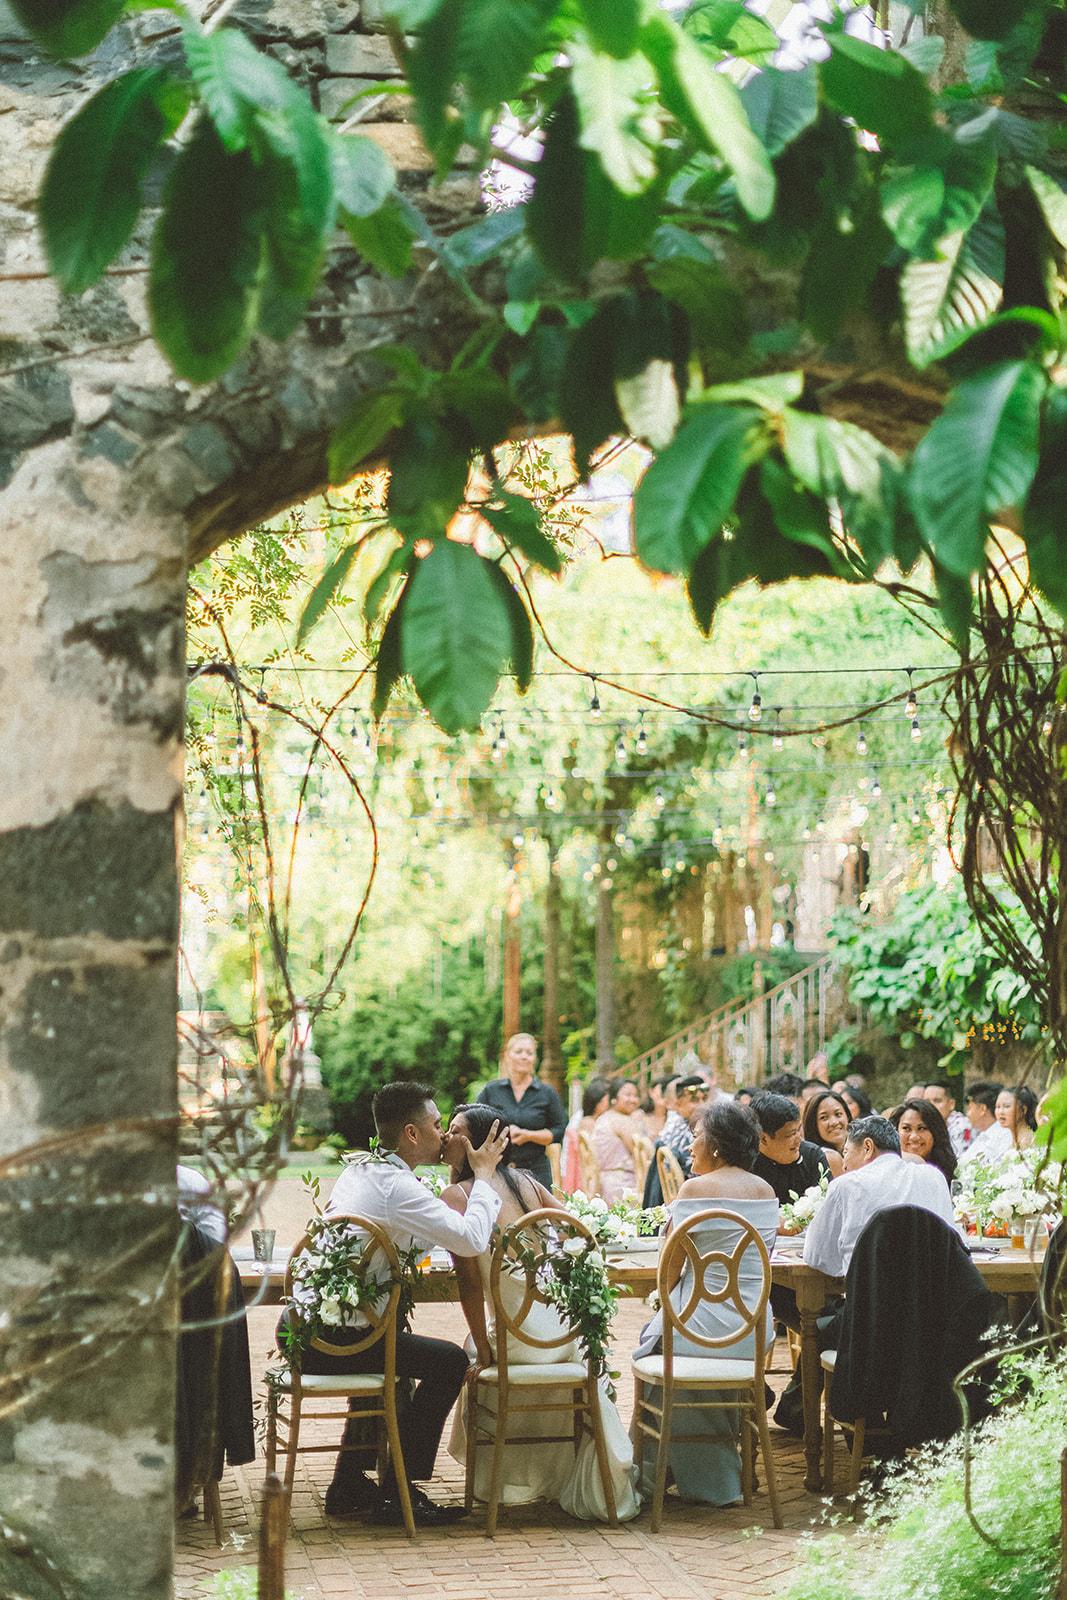 Haiku Mill Luxe Maui Wedding20190625_0306.jpg